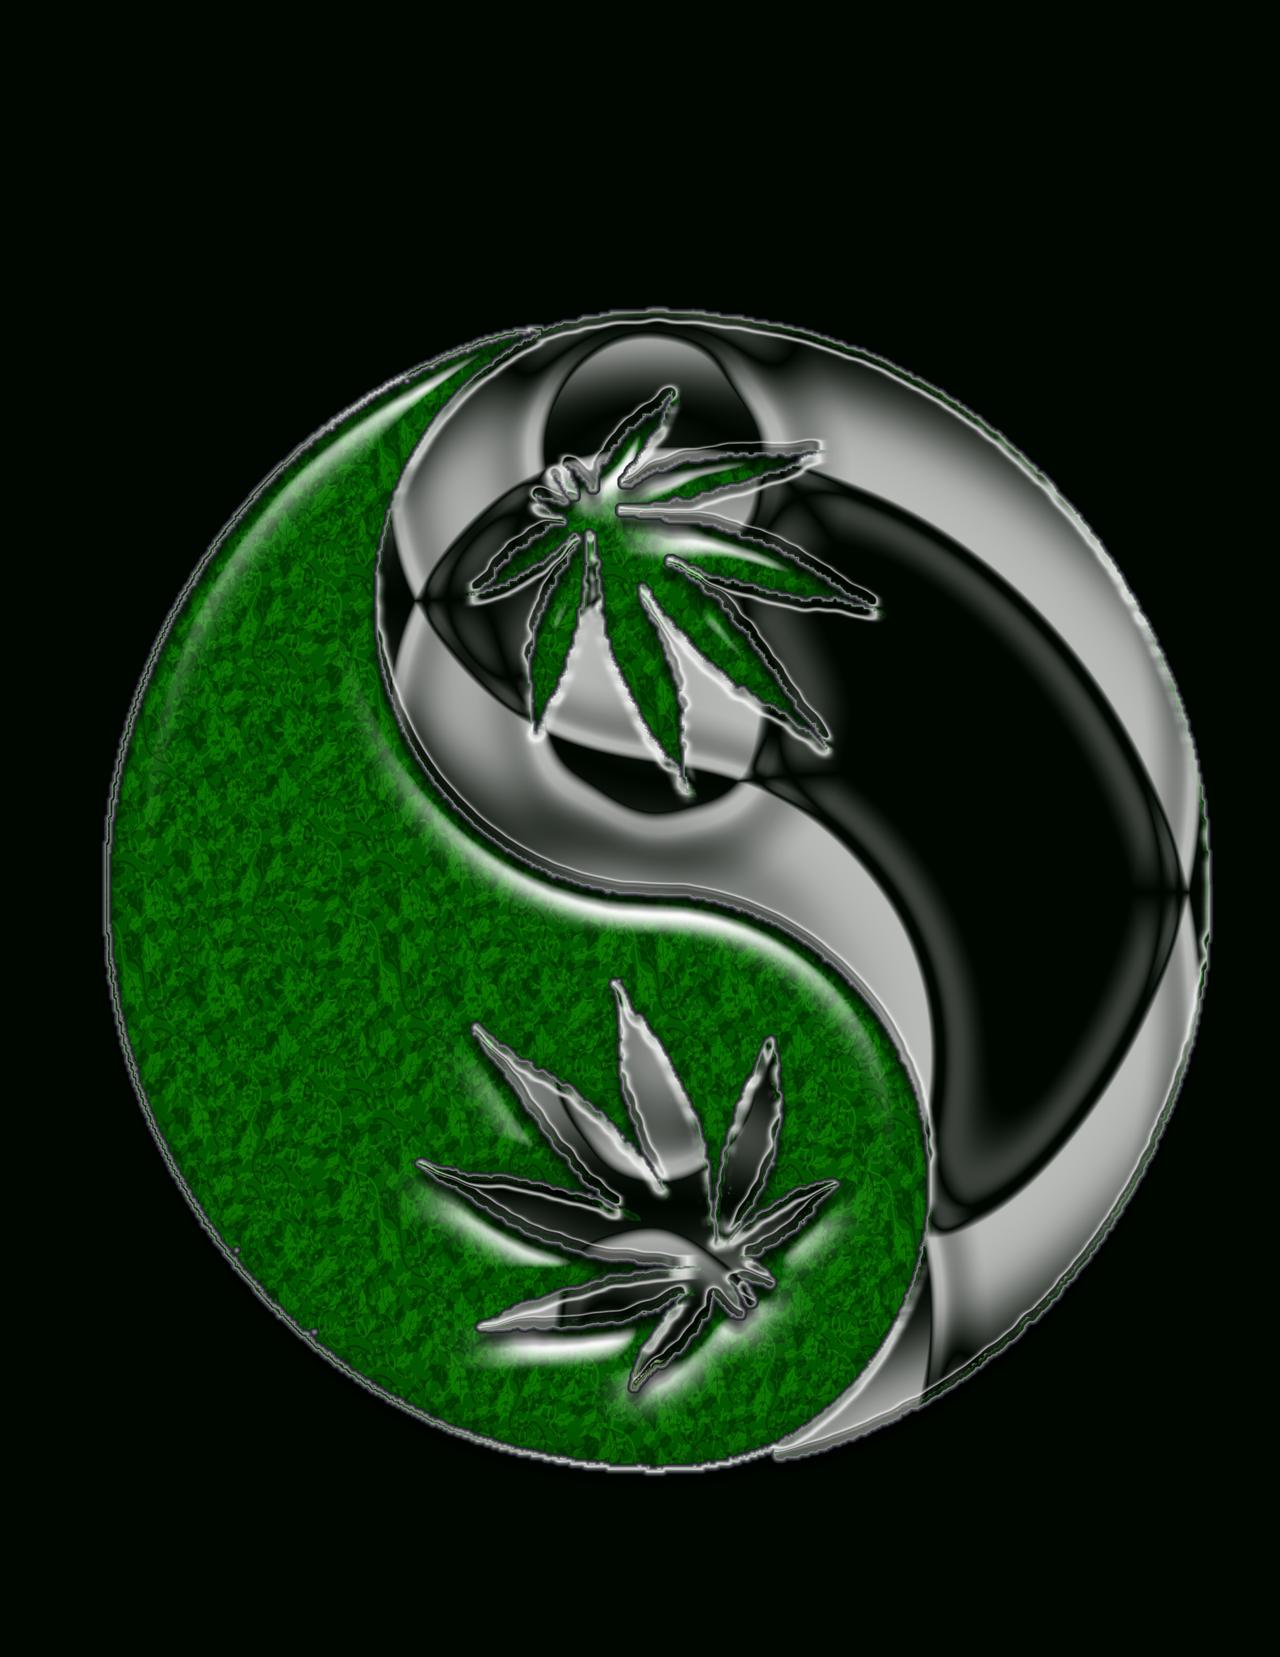 weed smoke art wallpaper - photo #39